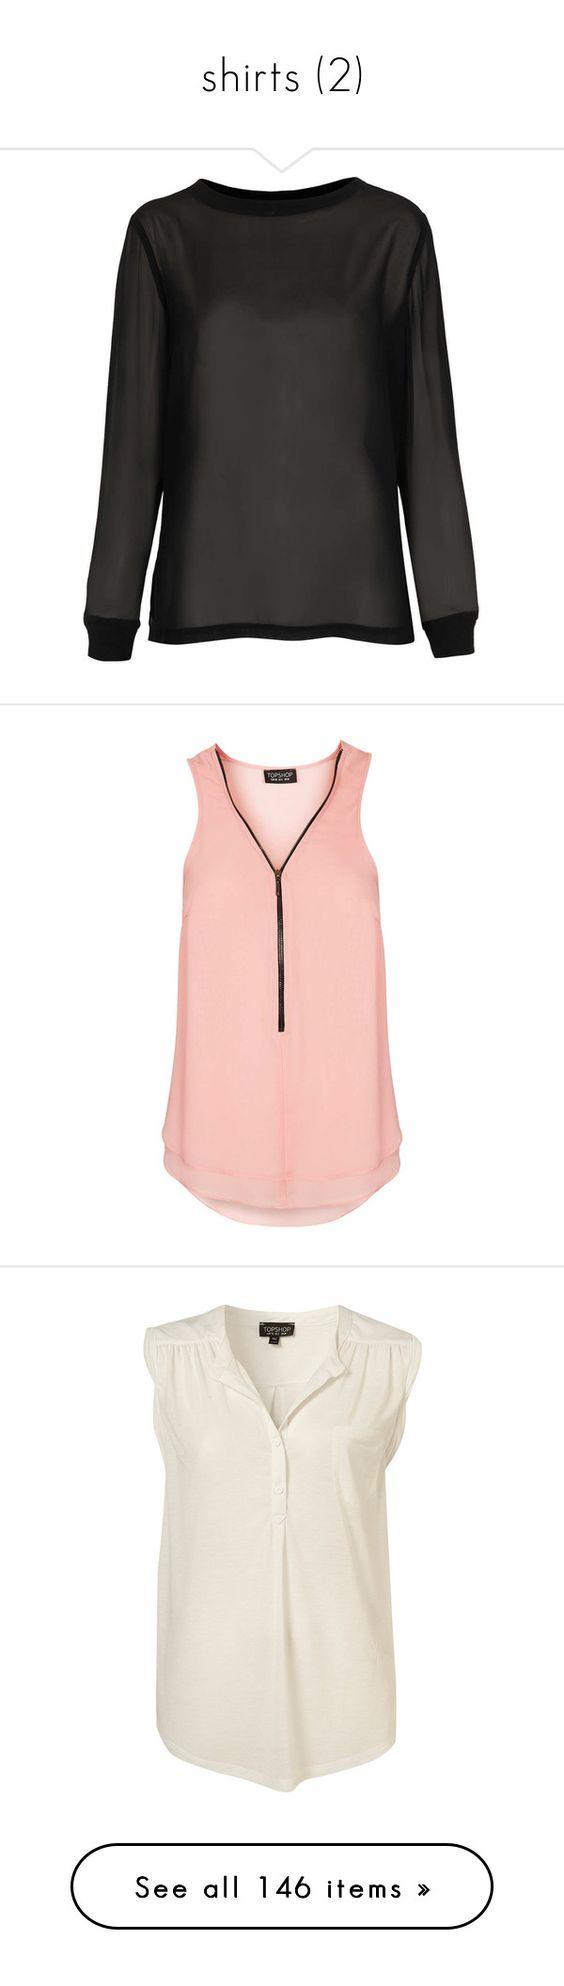 """shirts (2)"" by kateremington-1 ❤ liked on Polyvore featuring tops, hoodies, sweatshirts, shirts, sweaters, jumpers, black, chiffon shirt, woven shirts and long sleeve woven shirt"